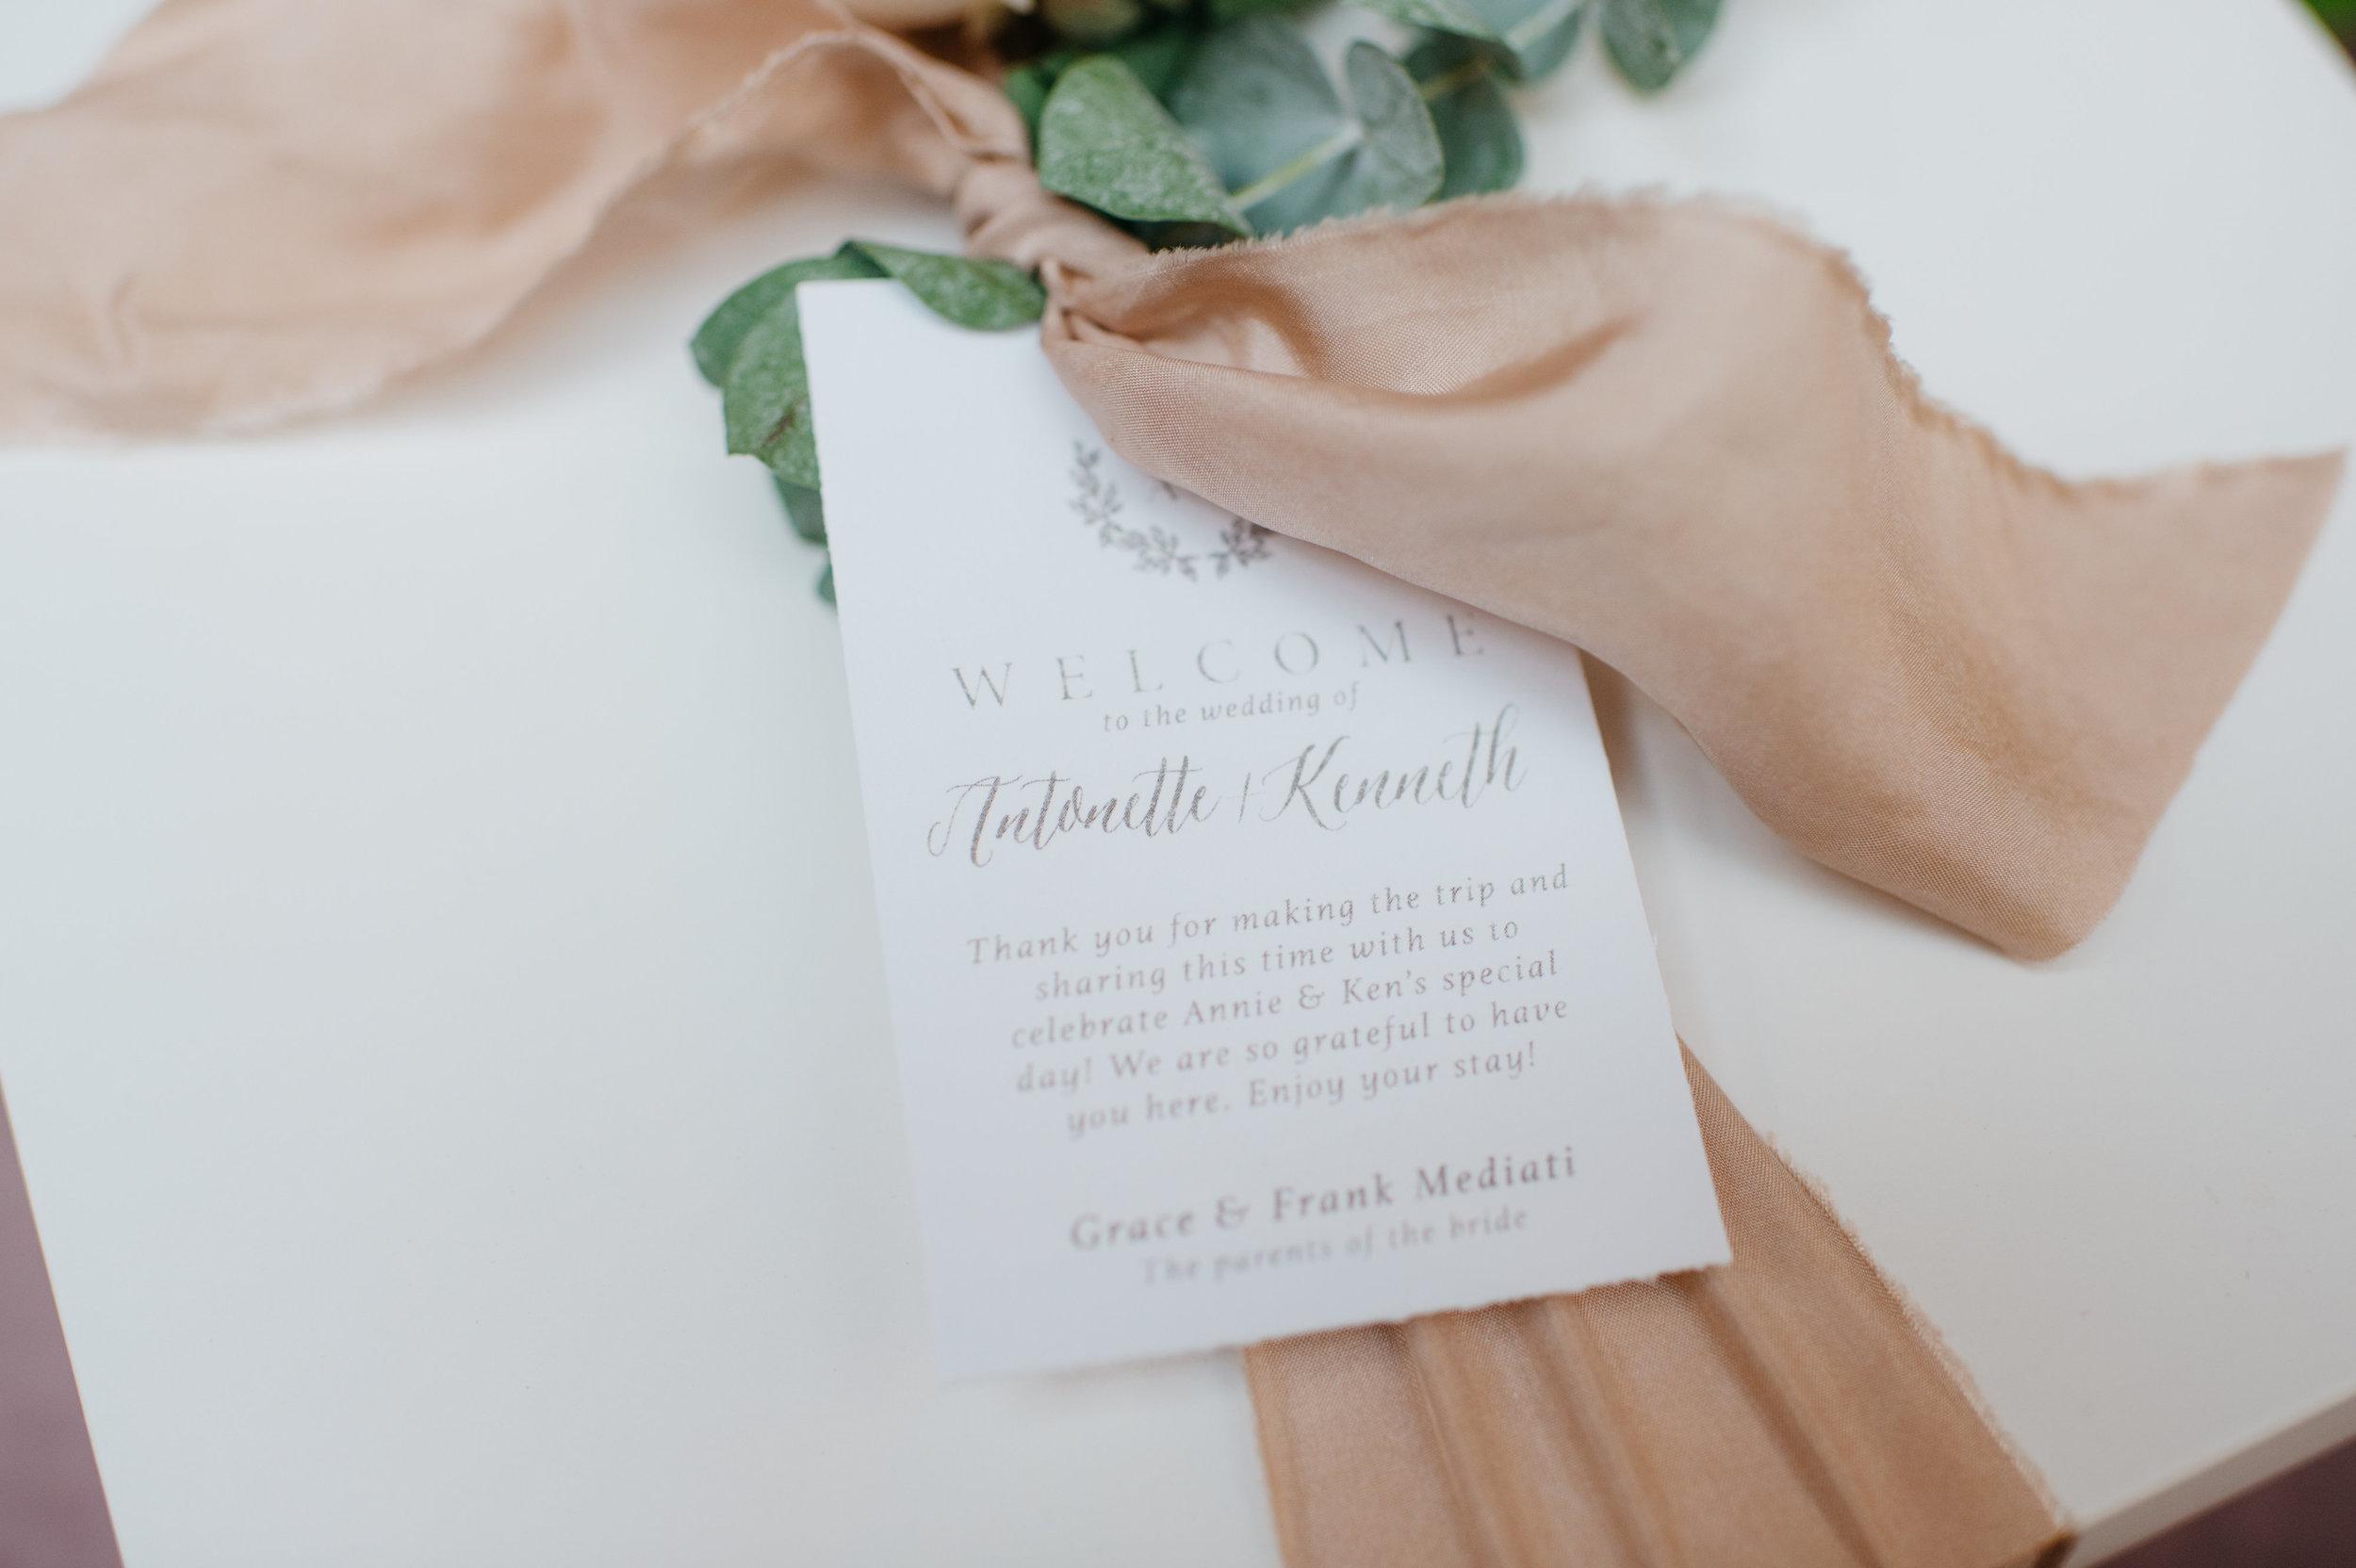 custom wedding planners michigan event design paper goods florals welcome gift